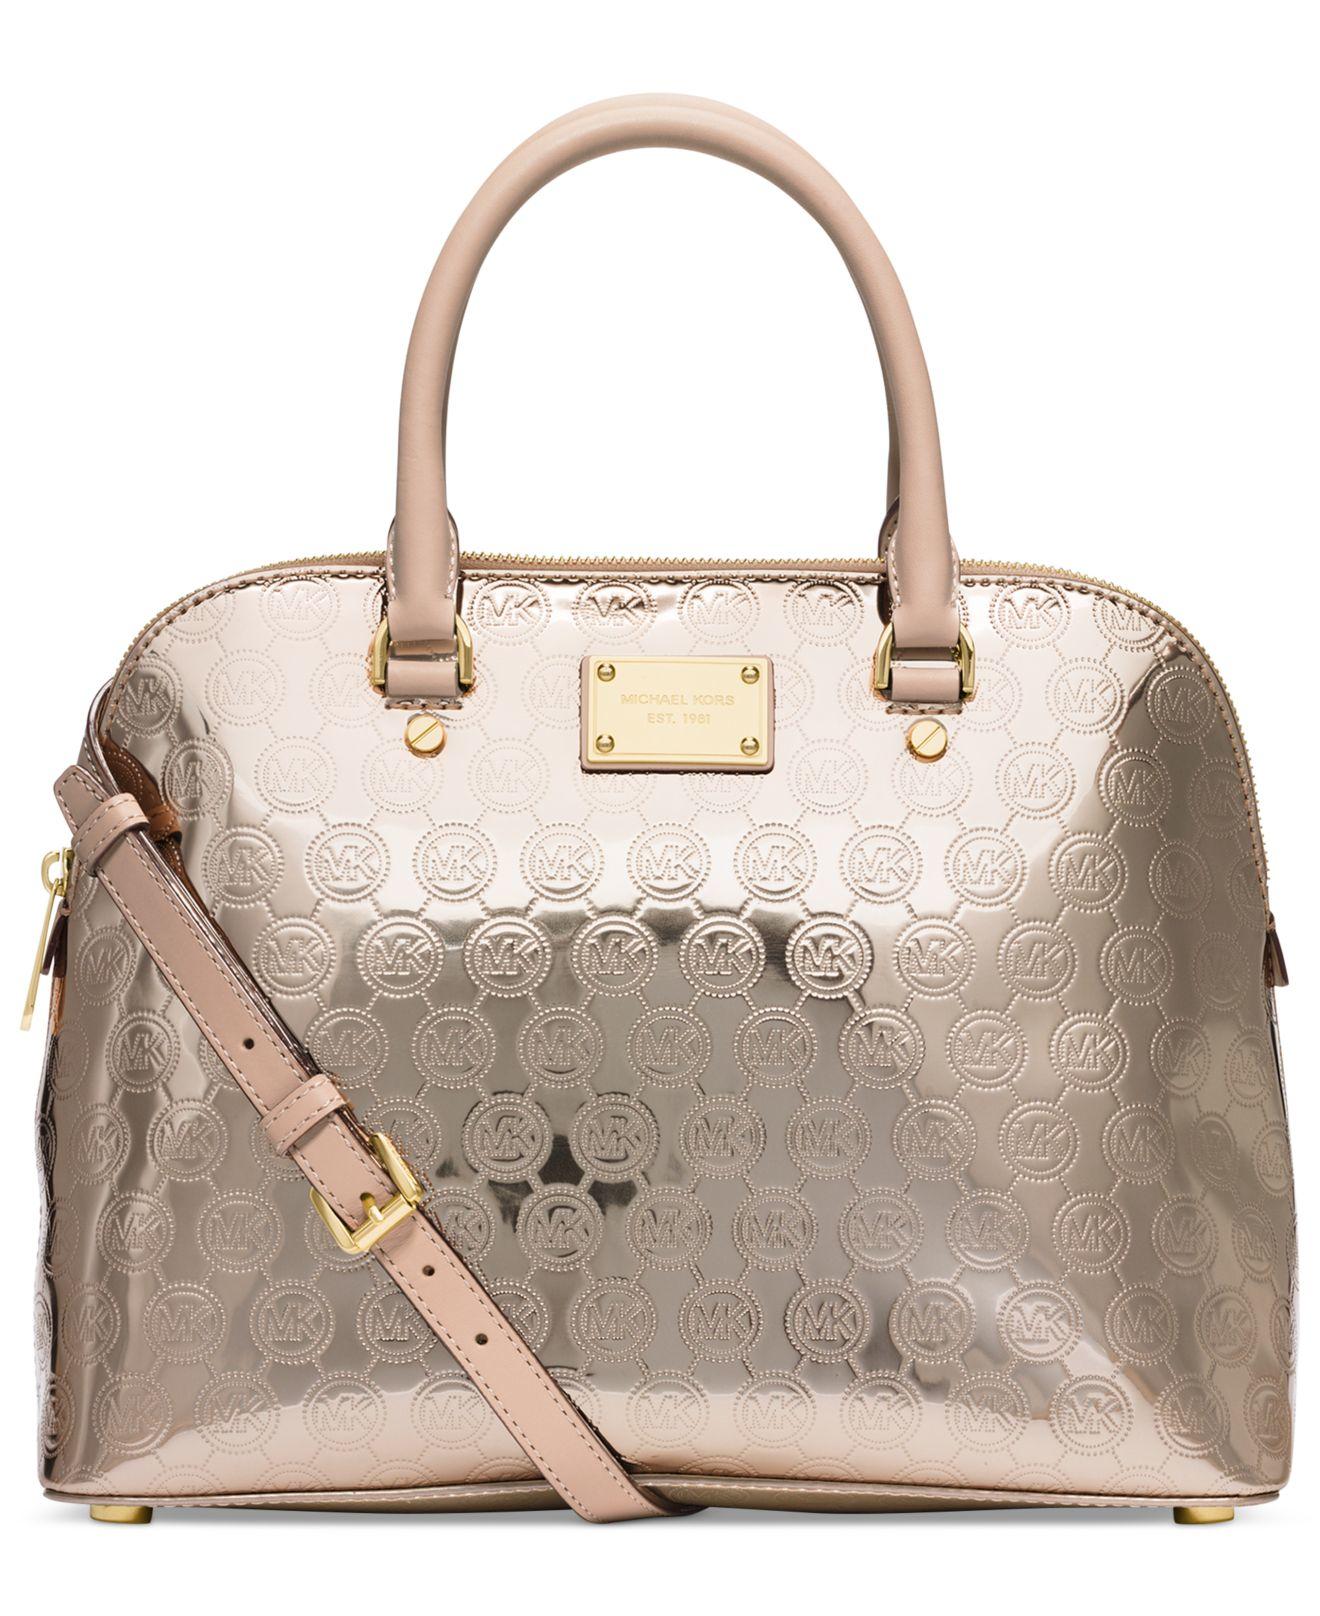 Michael Kors Cindy Laukku : Michael kors cindy medium dome satchel in brown lyst